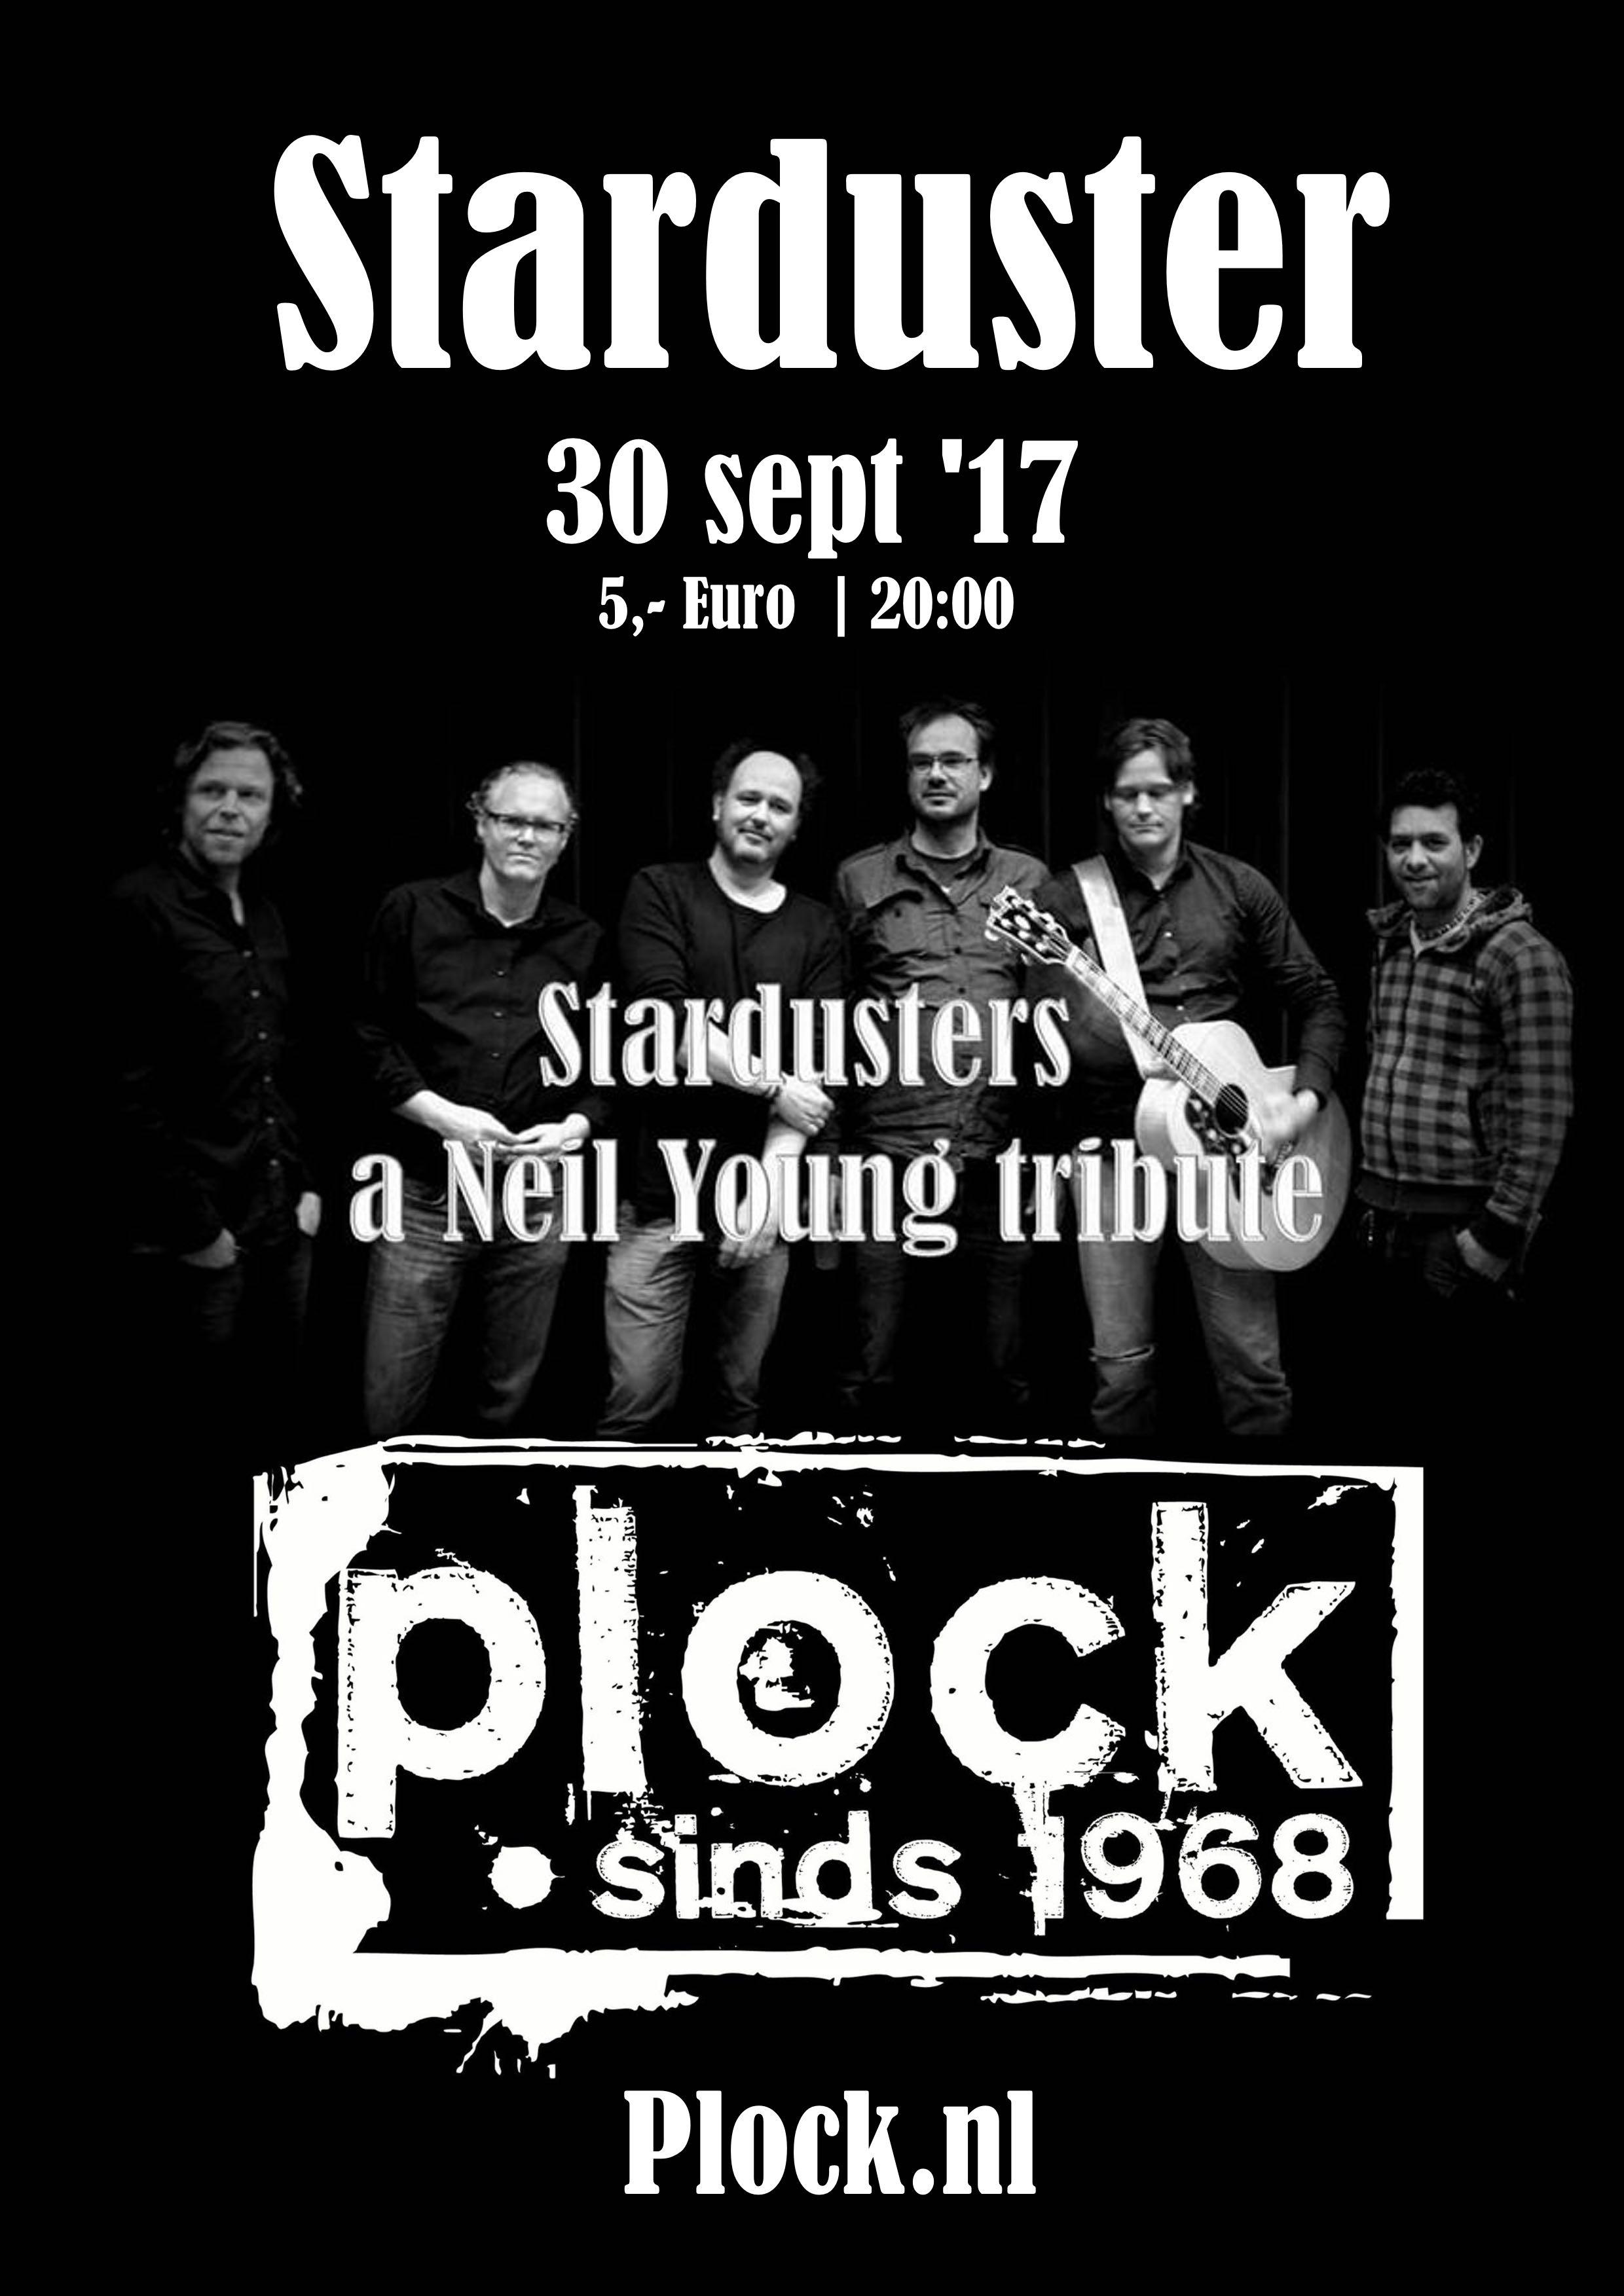 Starduster 30-9-17 @ Plock